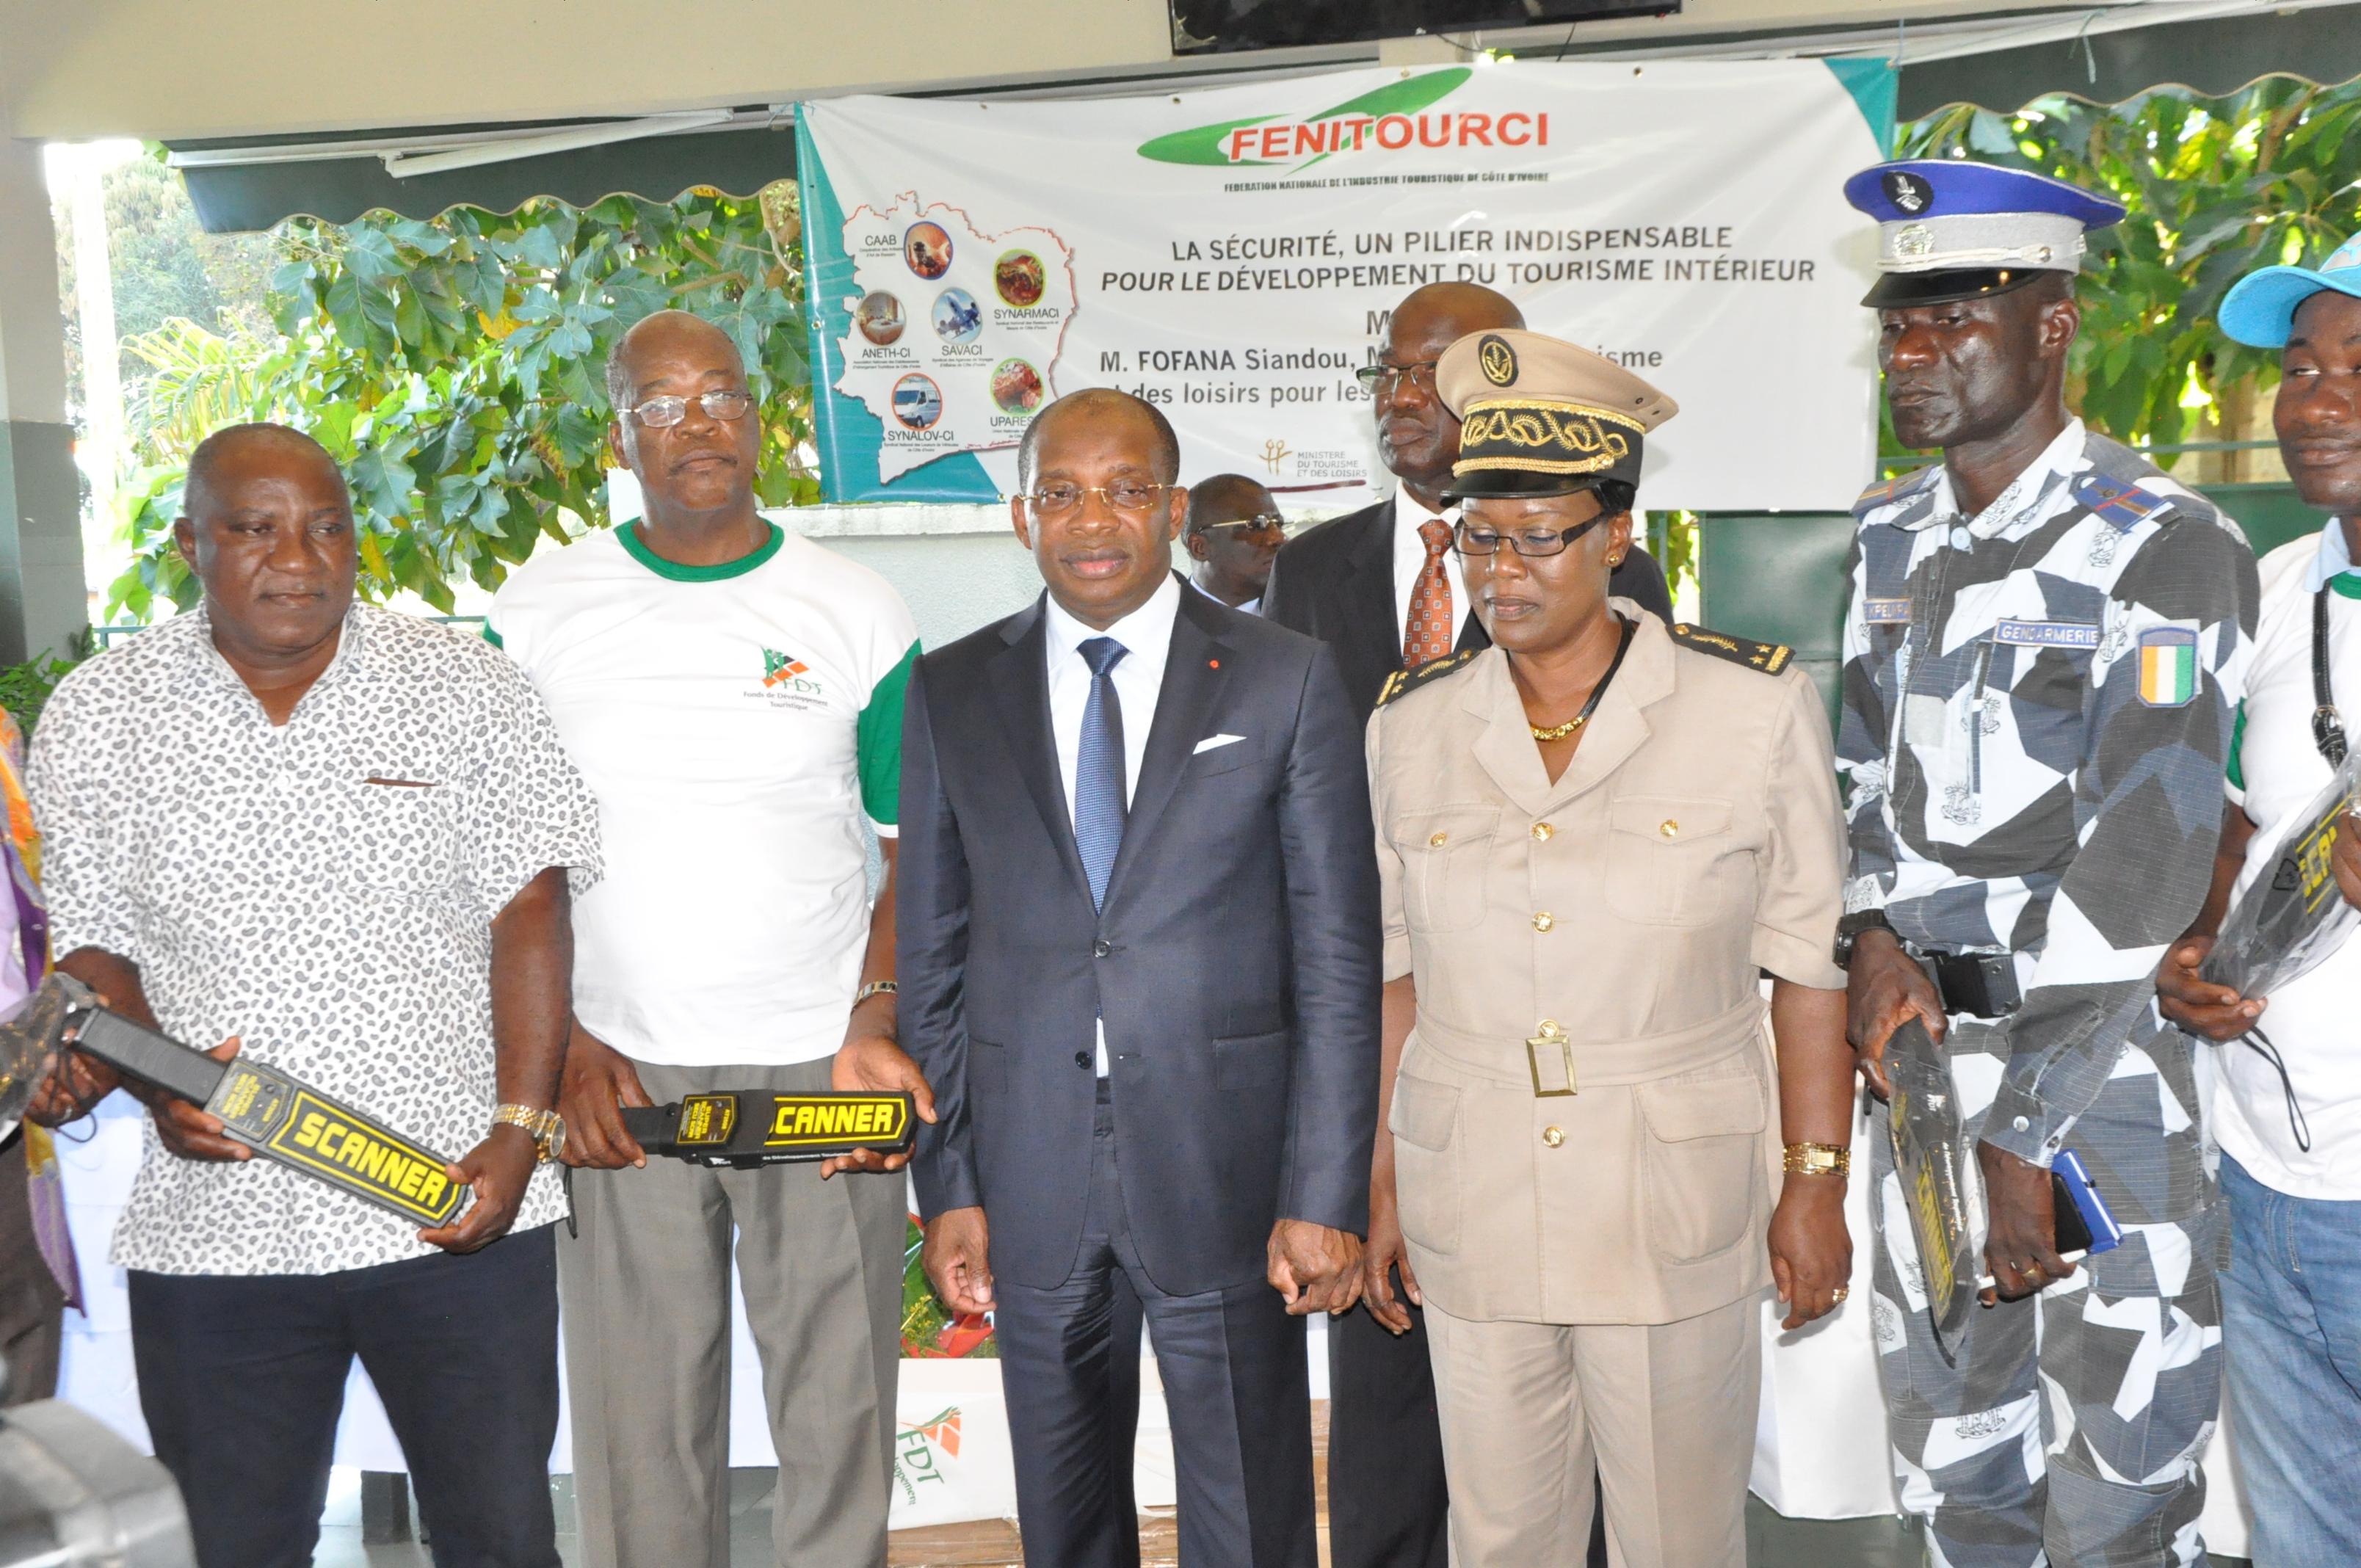 Tourisme,N'Zi,Siandou Fofana,Alassane Ouattara,Fonds de développement touristique